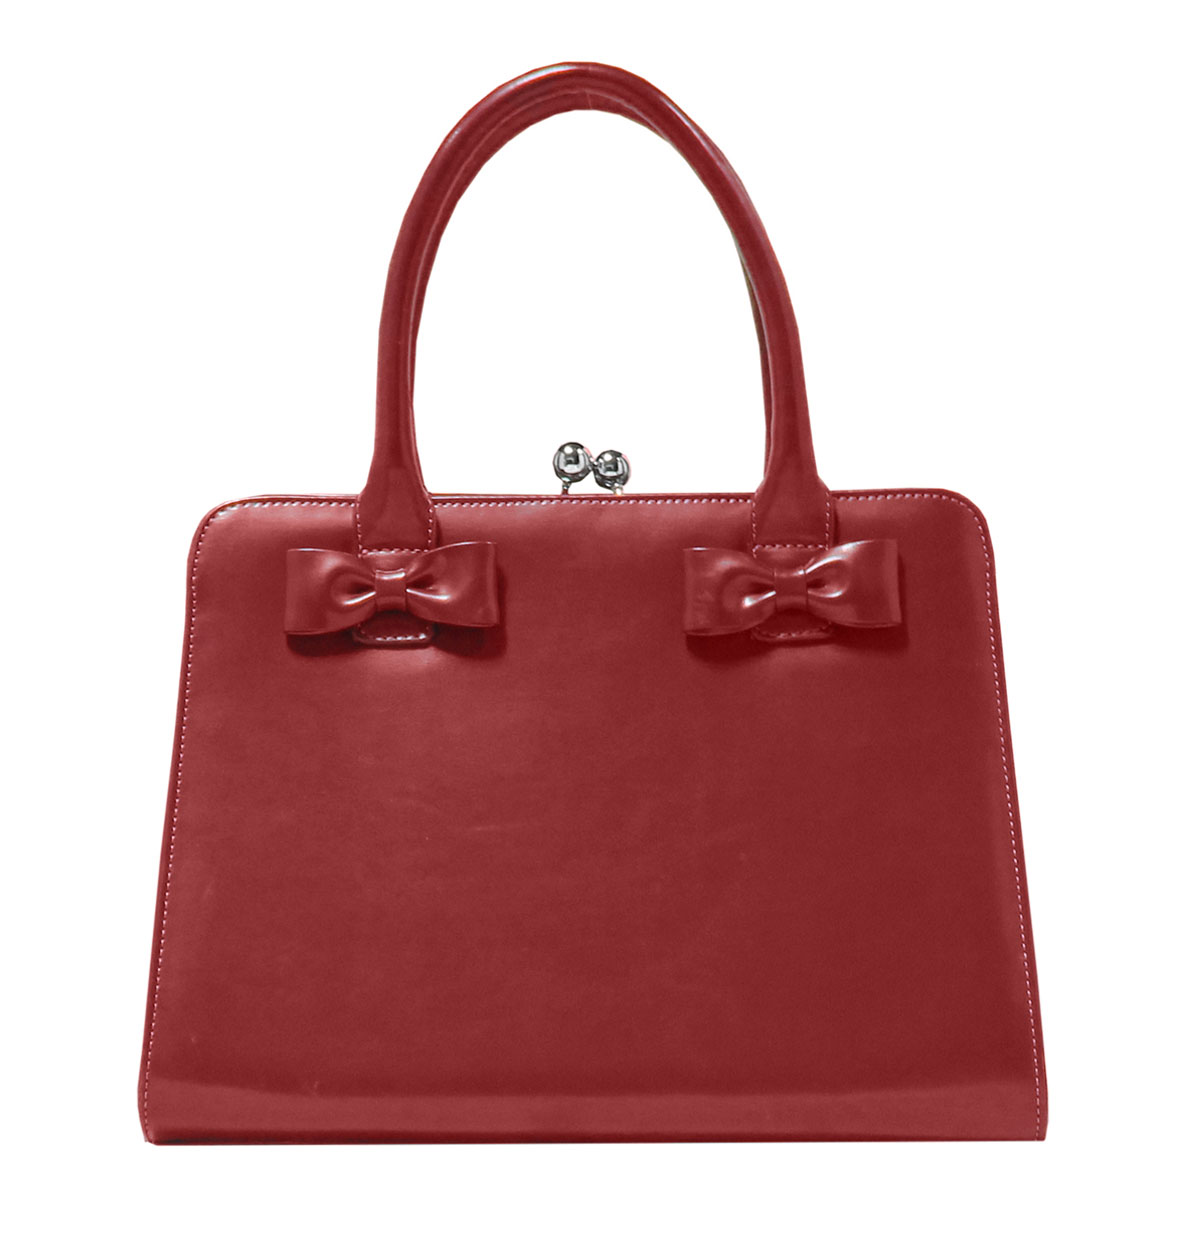 Jessica Bag Red